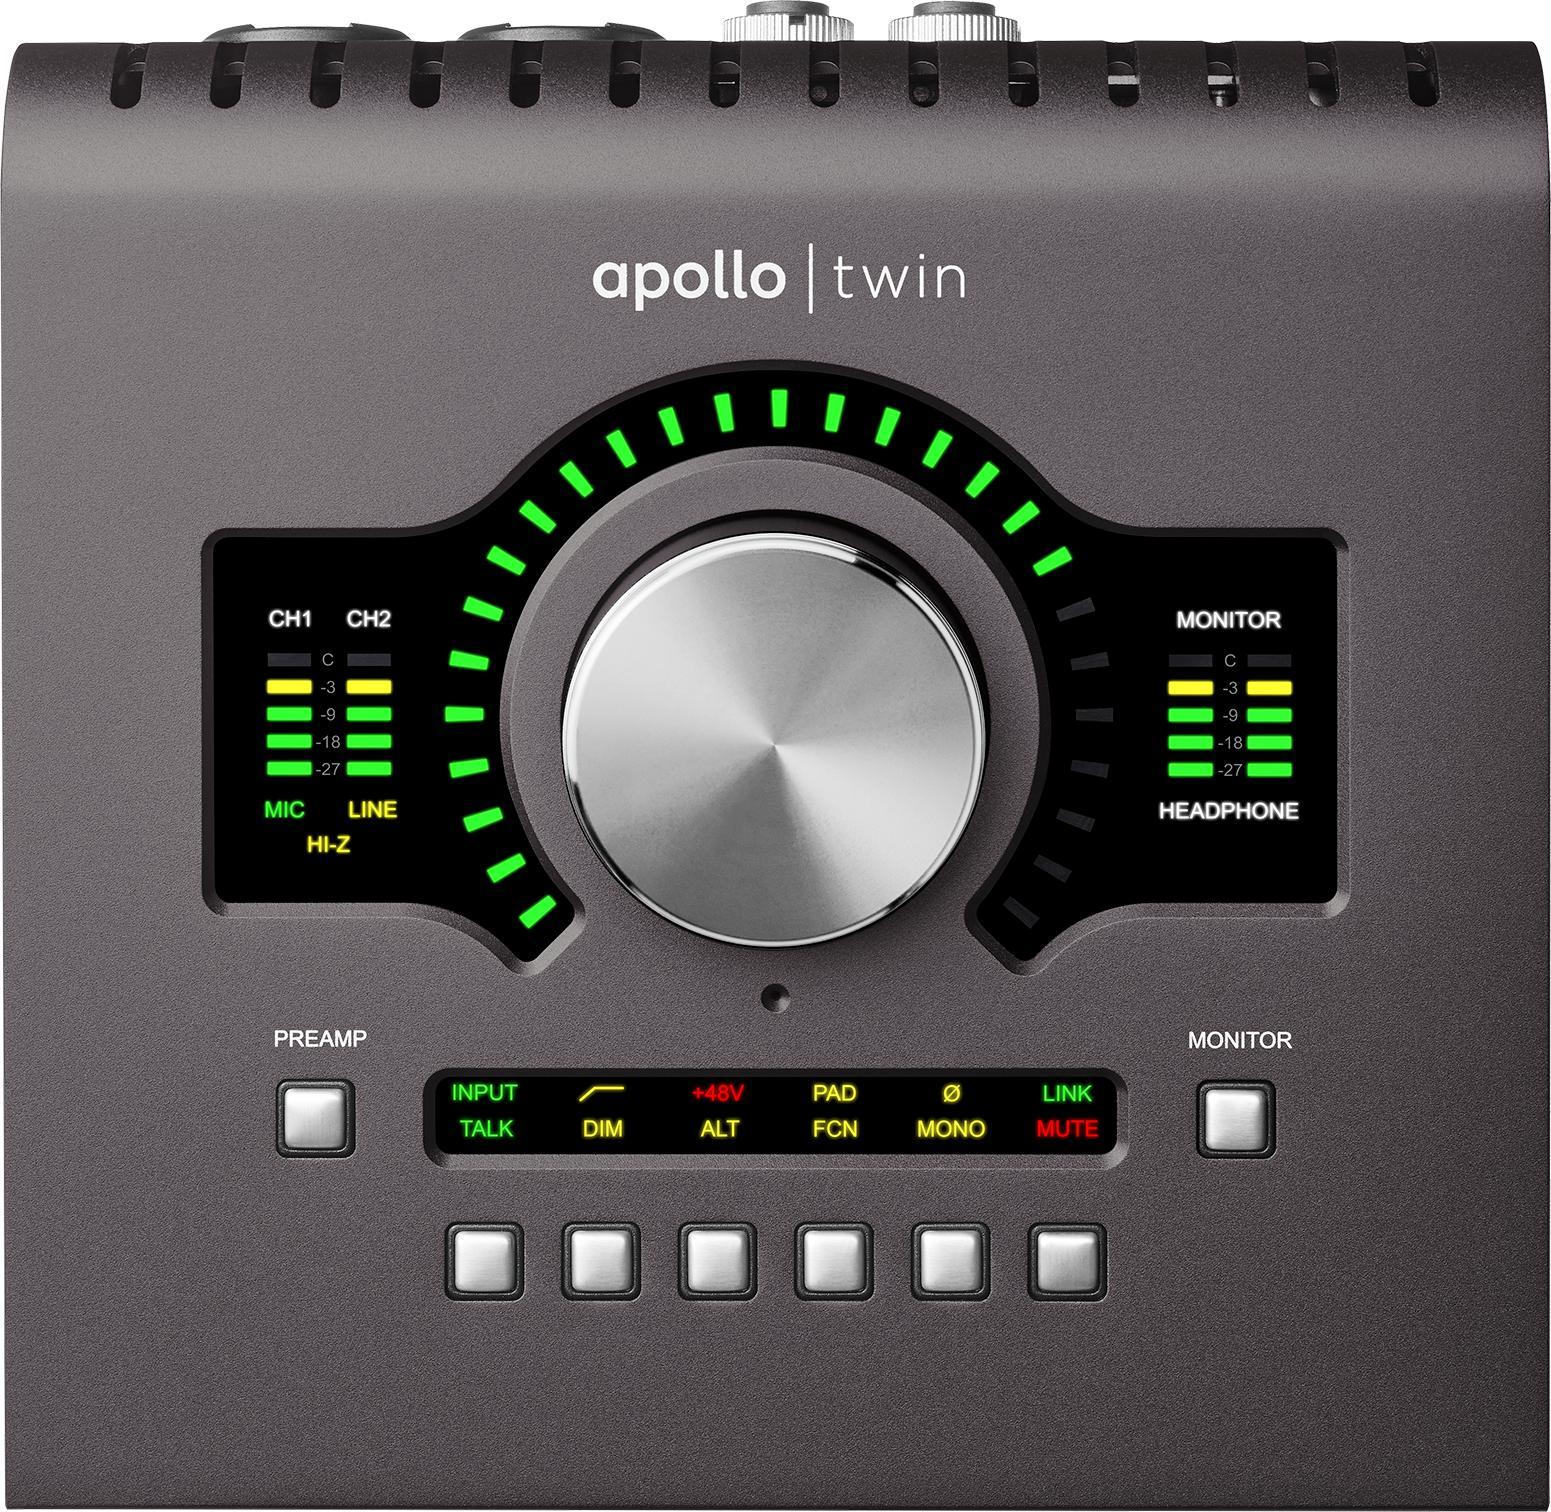 2. Universal Audio Apollo Twin MKII Duo (APLTWDII)